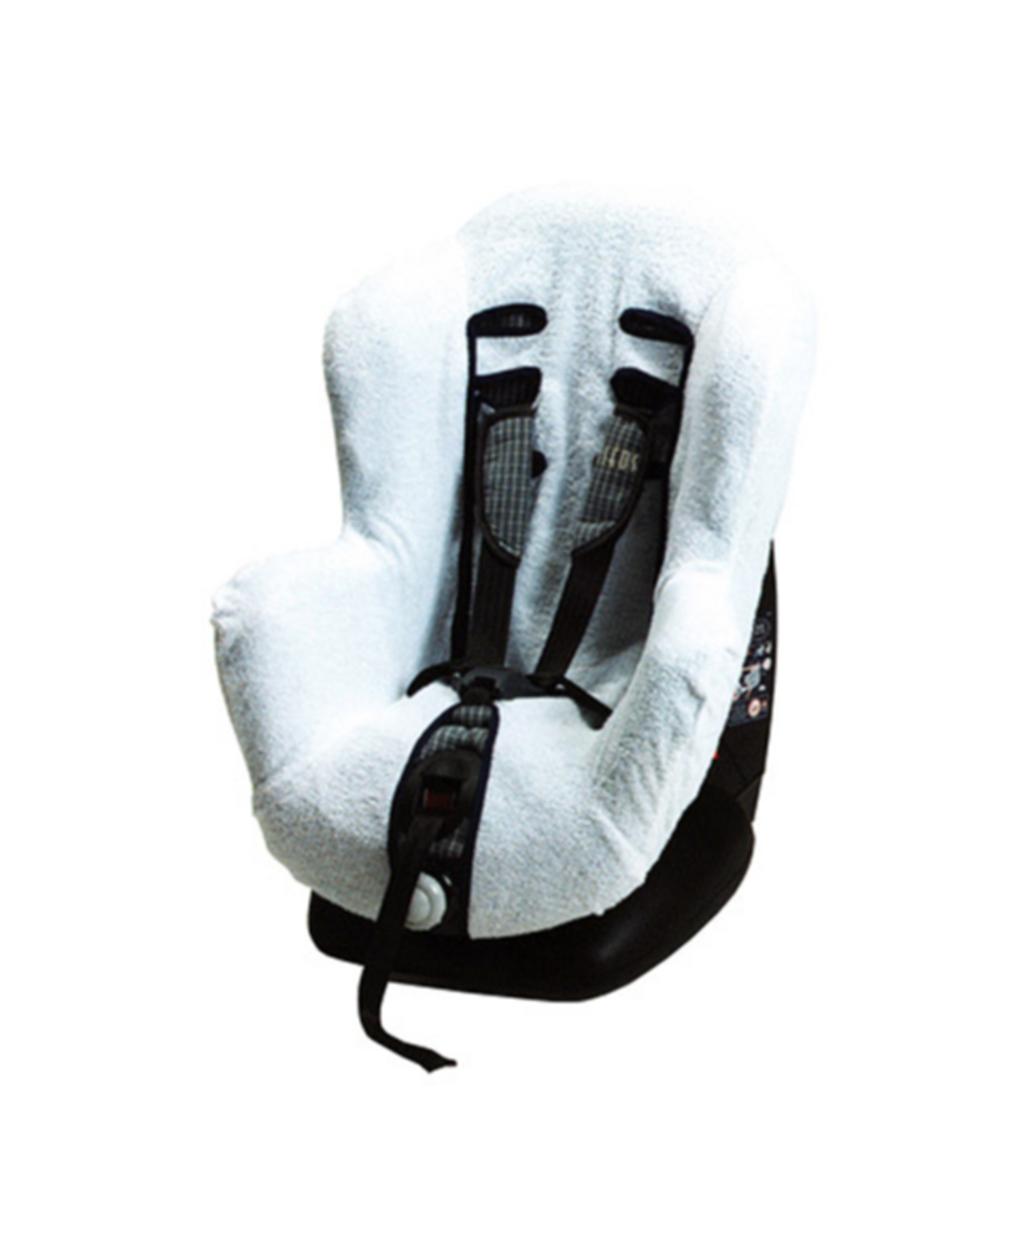 Bébé Confort - Κάλυμμα για Κάθισμα Αυτοκινήτου Iseos - Λευκό